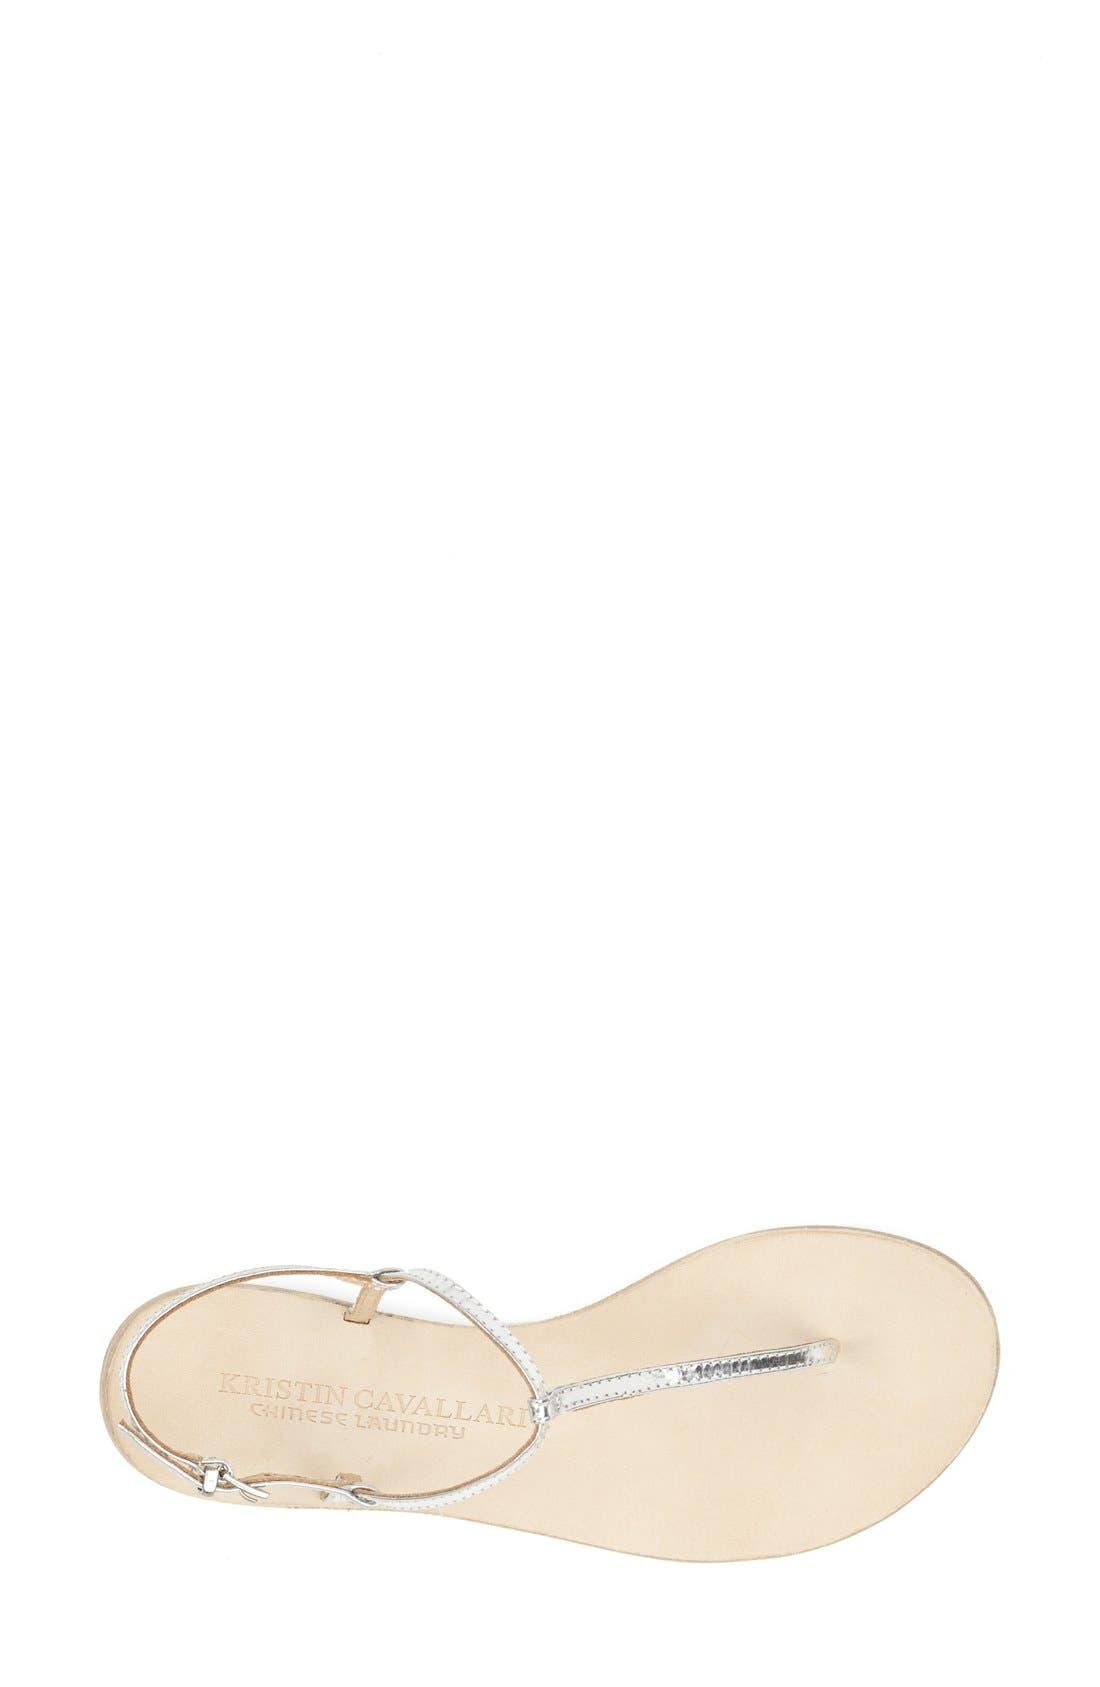 Alternate Image 3  - Kristin Cavallari 'Gigi' Thong Sandal